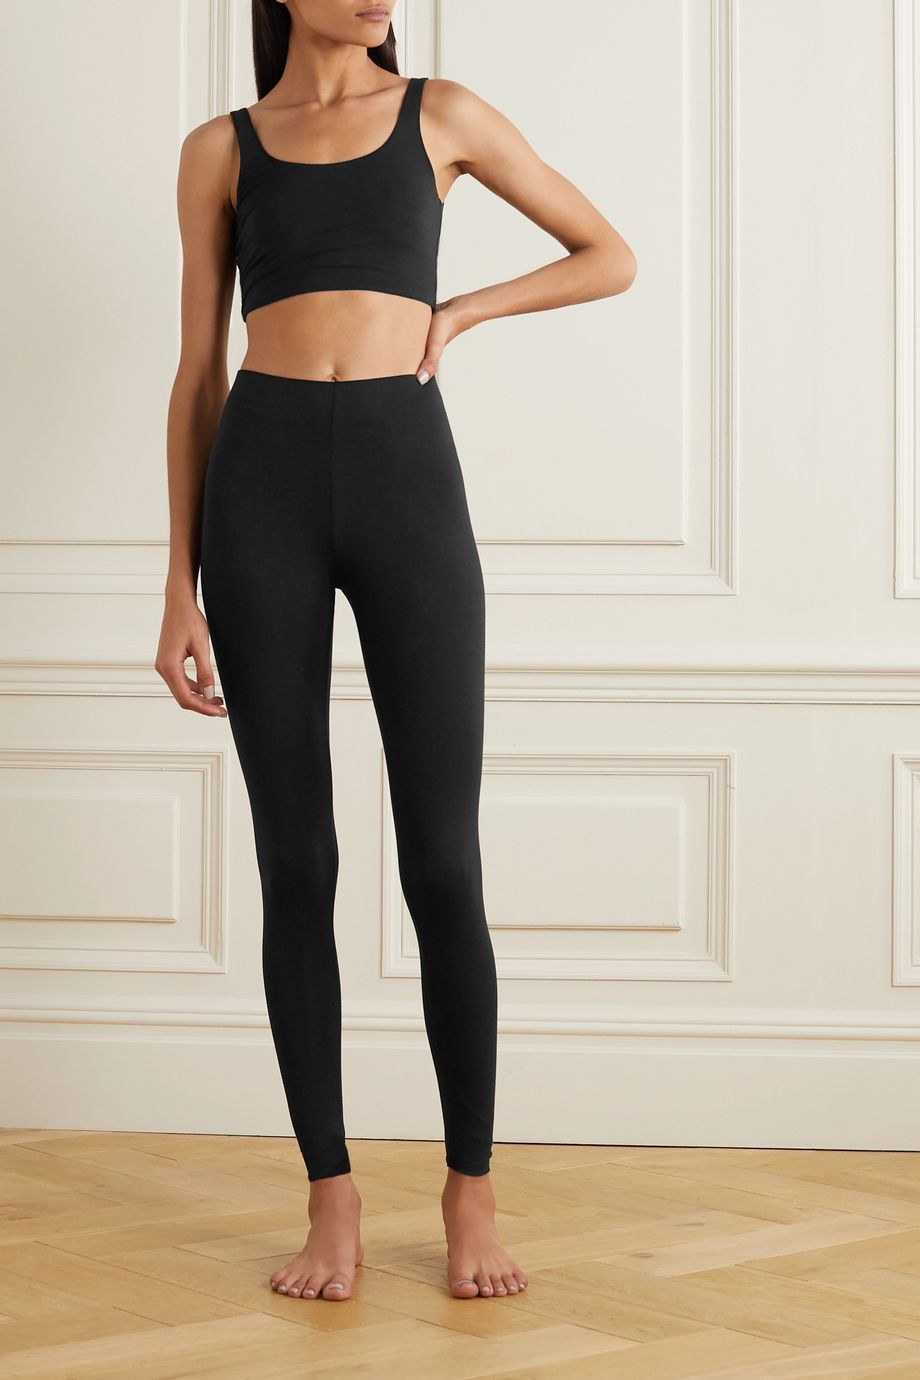 Skin Calypso 弹力有机比马棉平纹布紧身运动裤